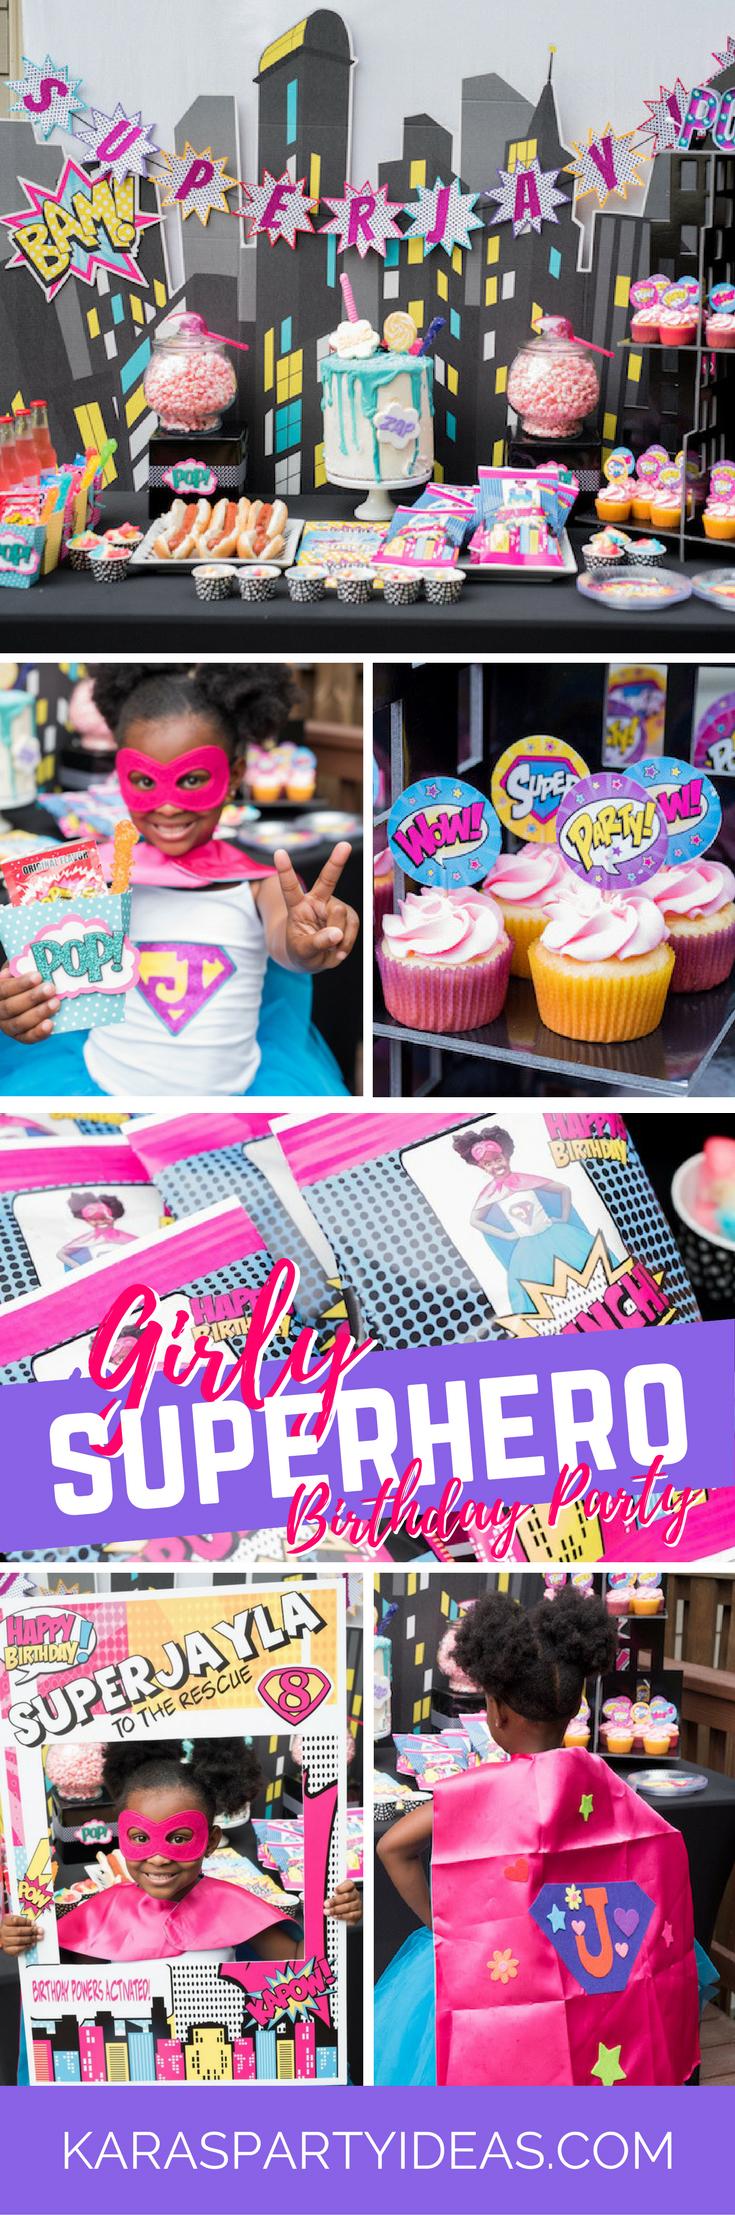 Tea time tea birthday party via kara s party ideas karaspartyideas com - Girly Superhero Birthday Party Via Kara S Party Ideas Karaspartyideas Com